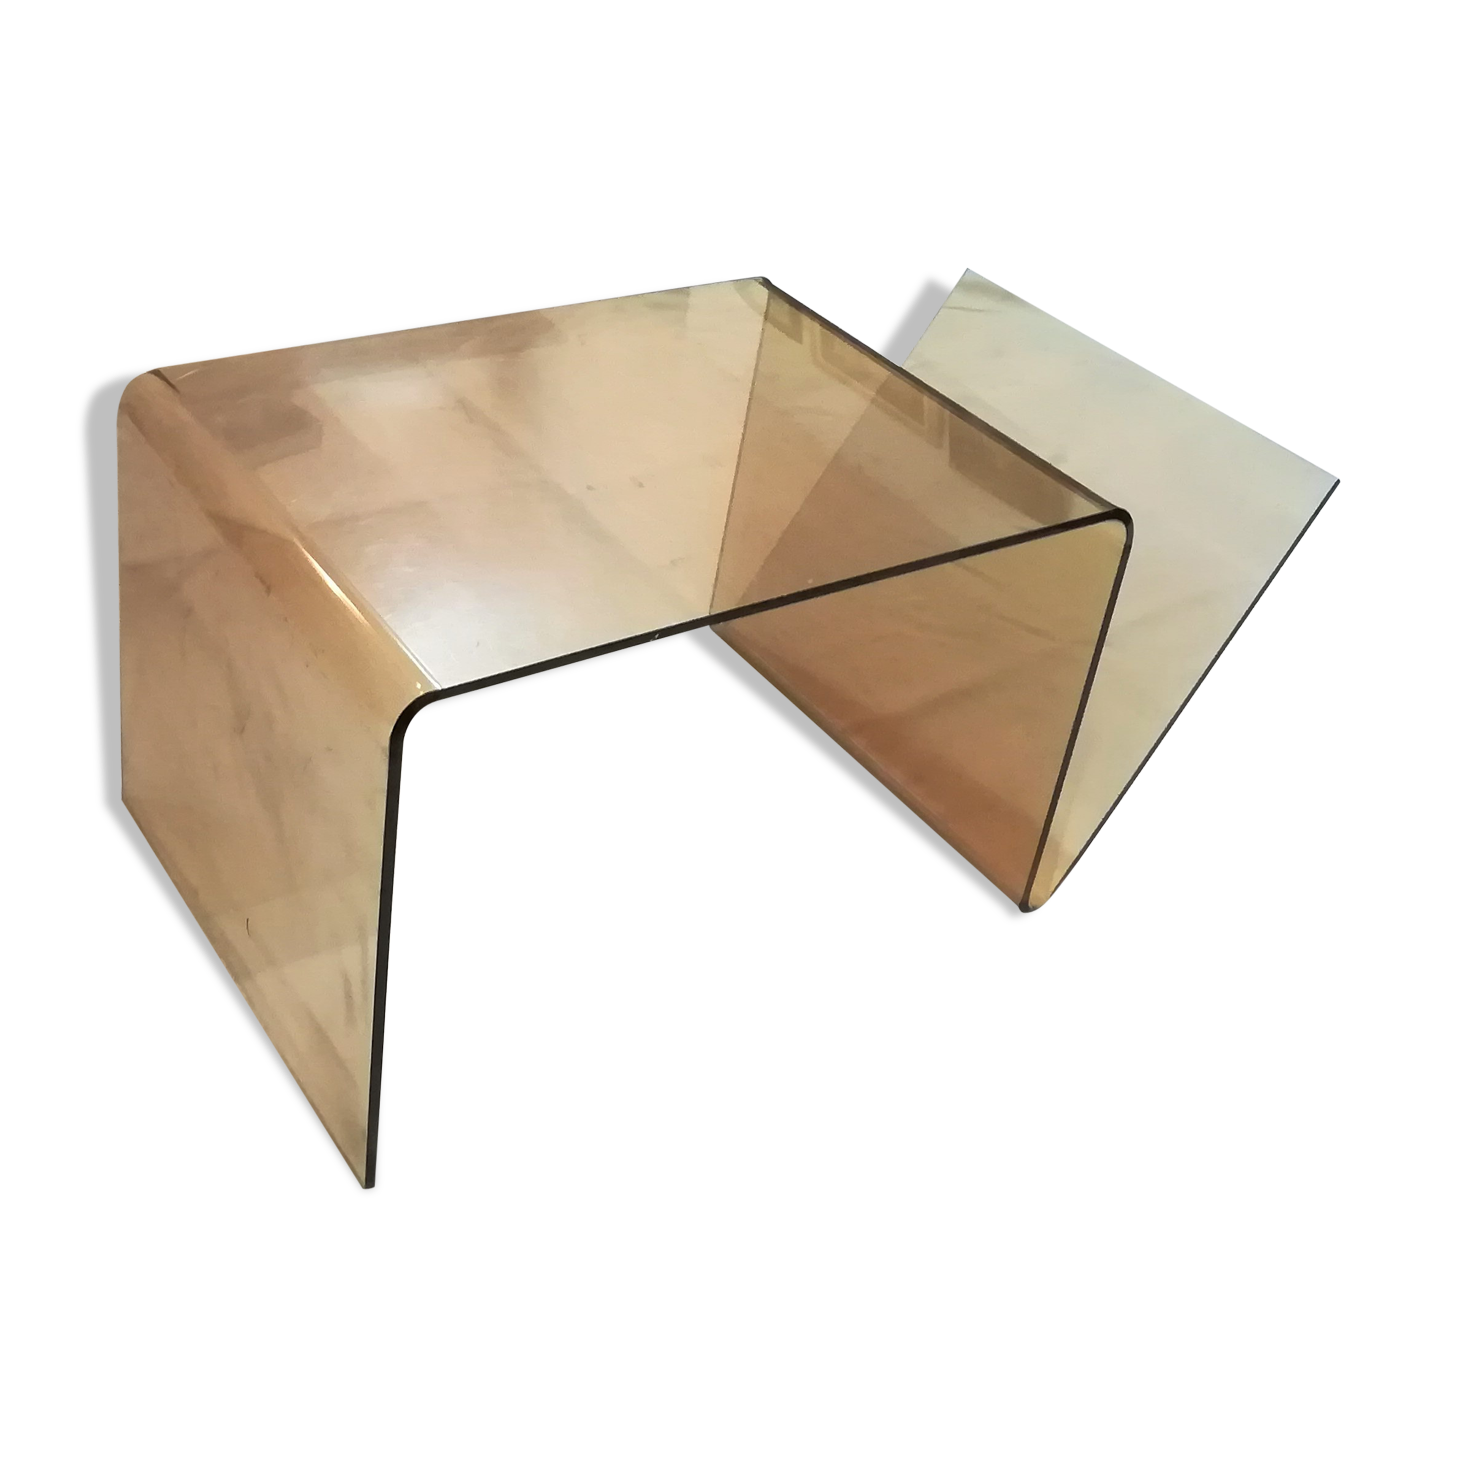 table basse en plexiglas finest tables basses modernes hexagonales en plexiglas with table. Black Bedroom Furniture Sets. Home Design Ideas